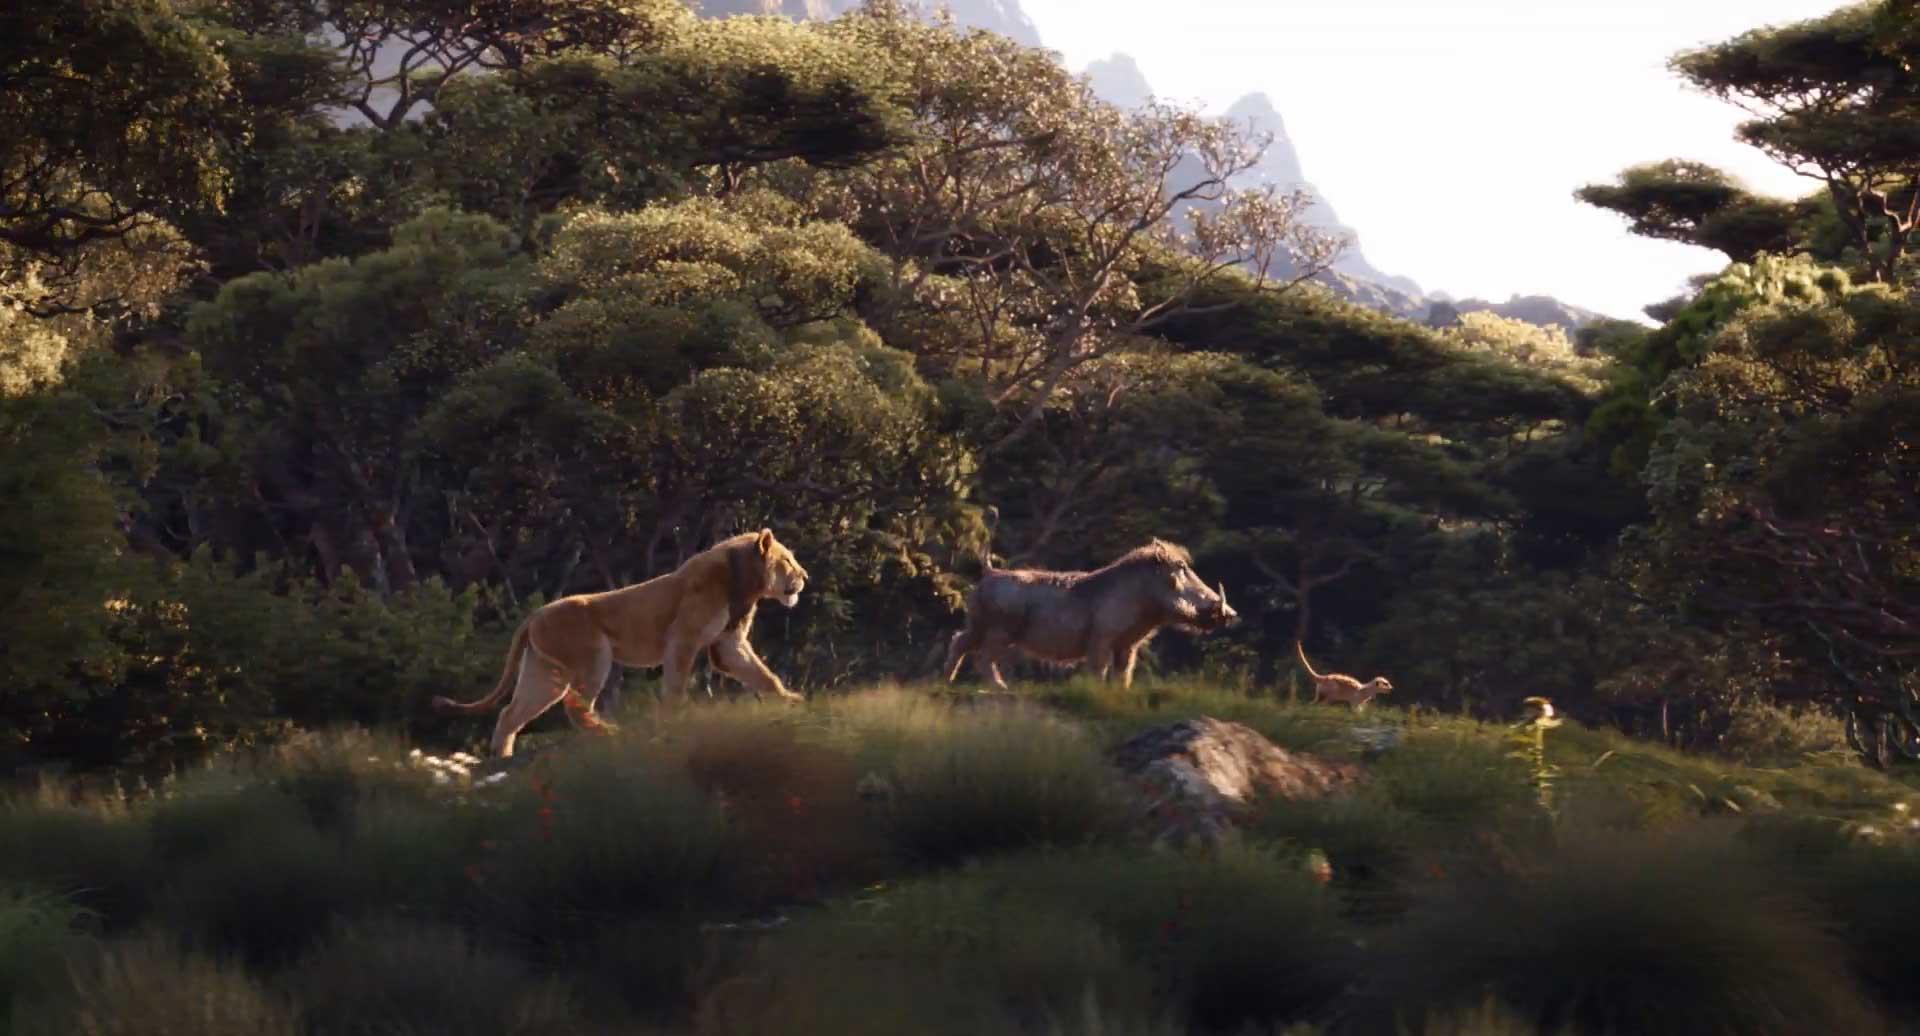 The Lion King 2019 Still - Hakuna Matata